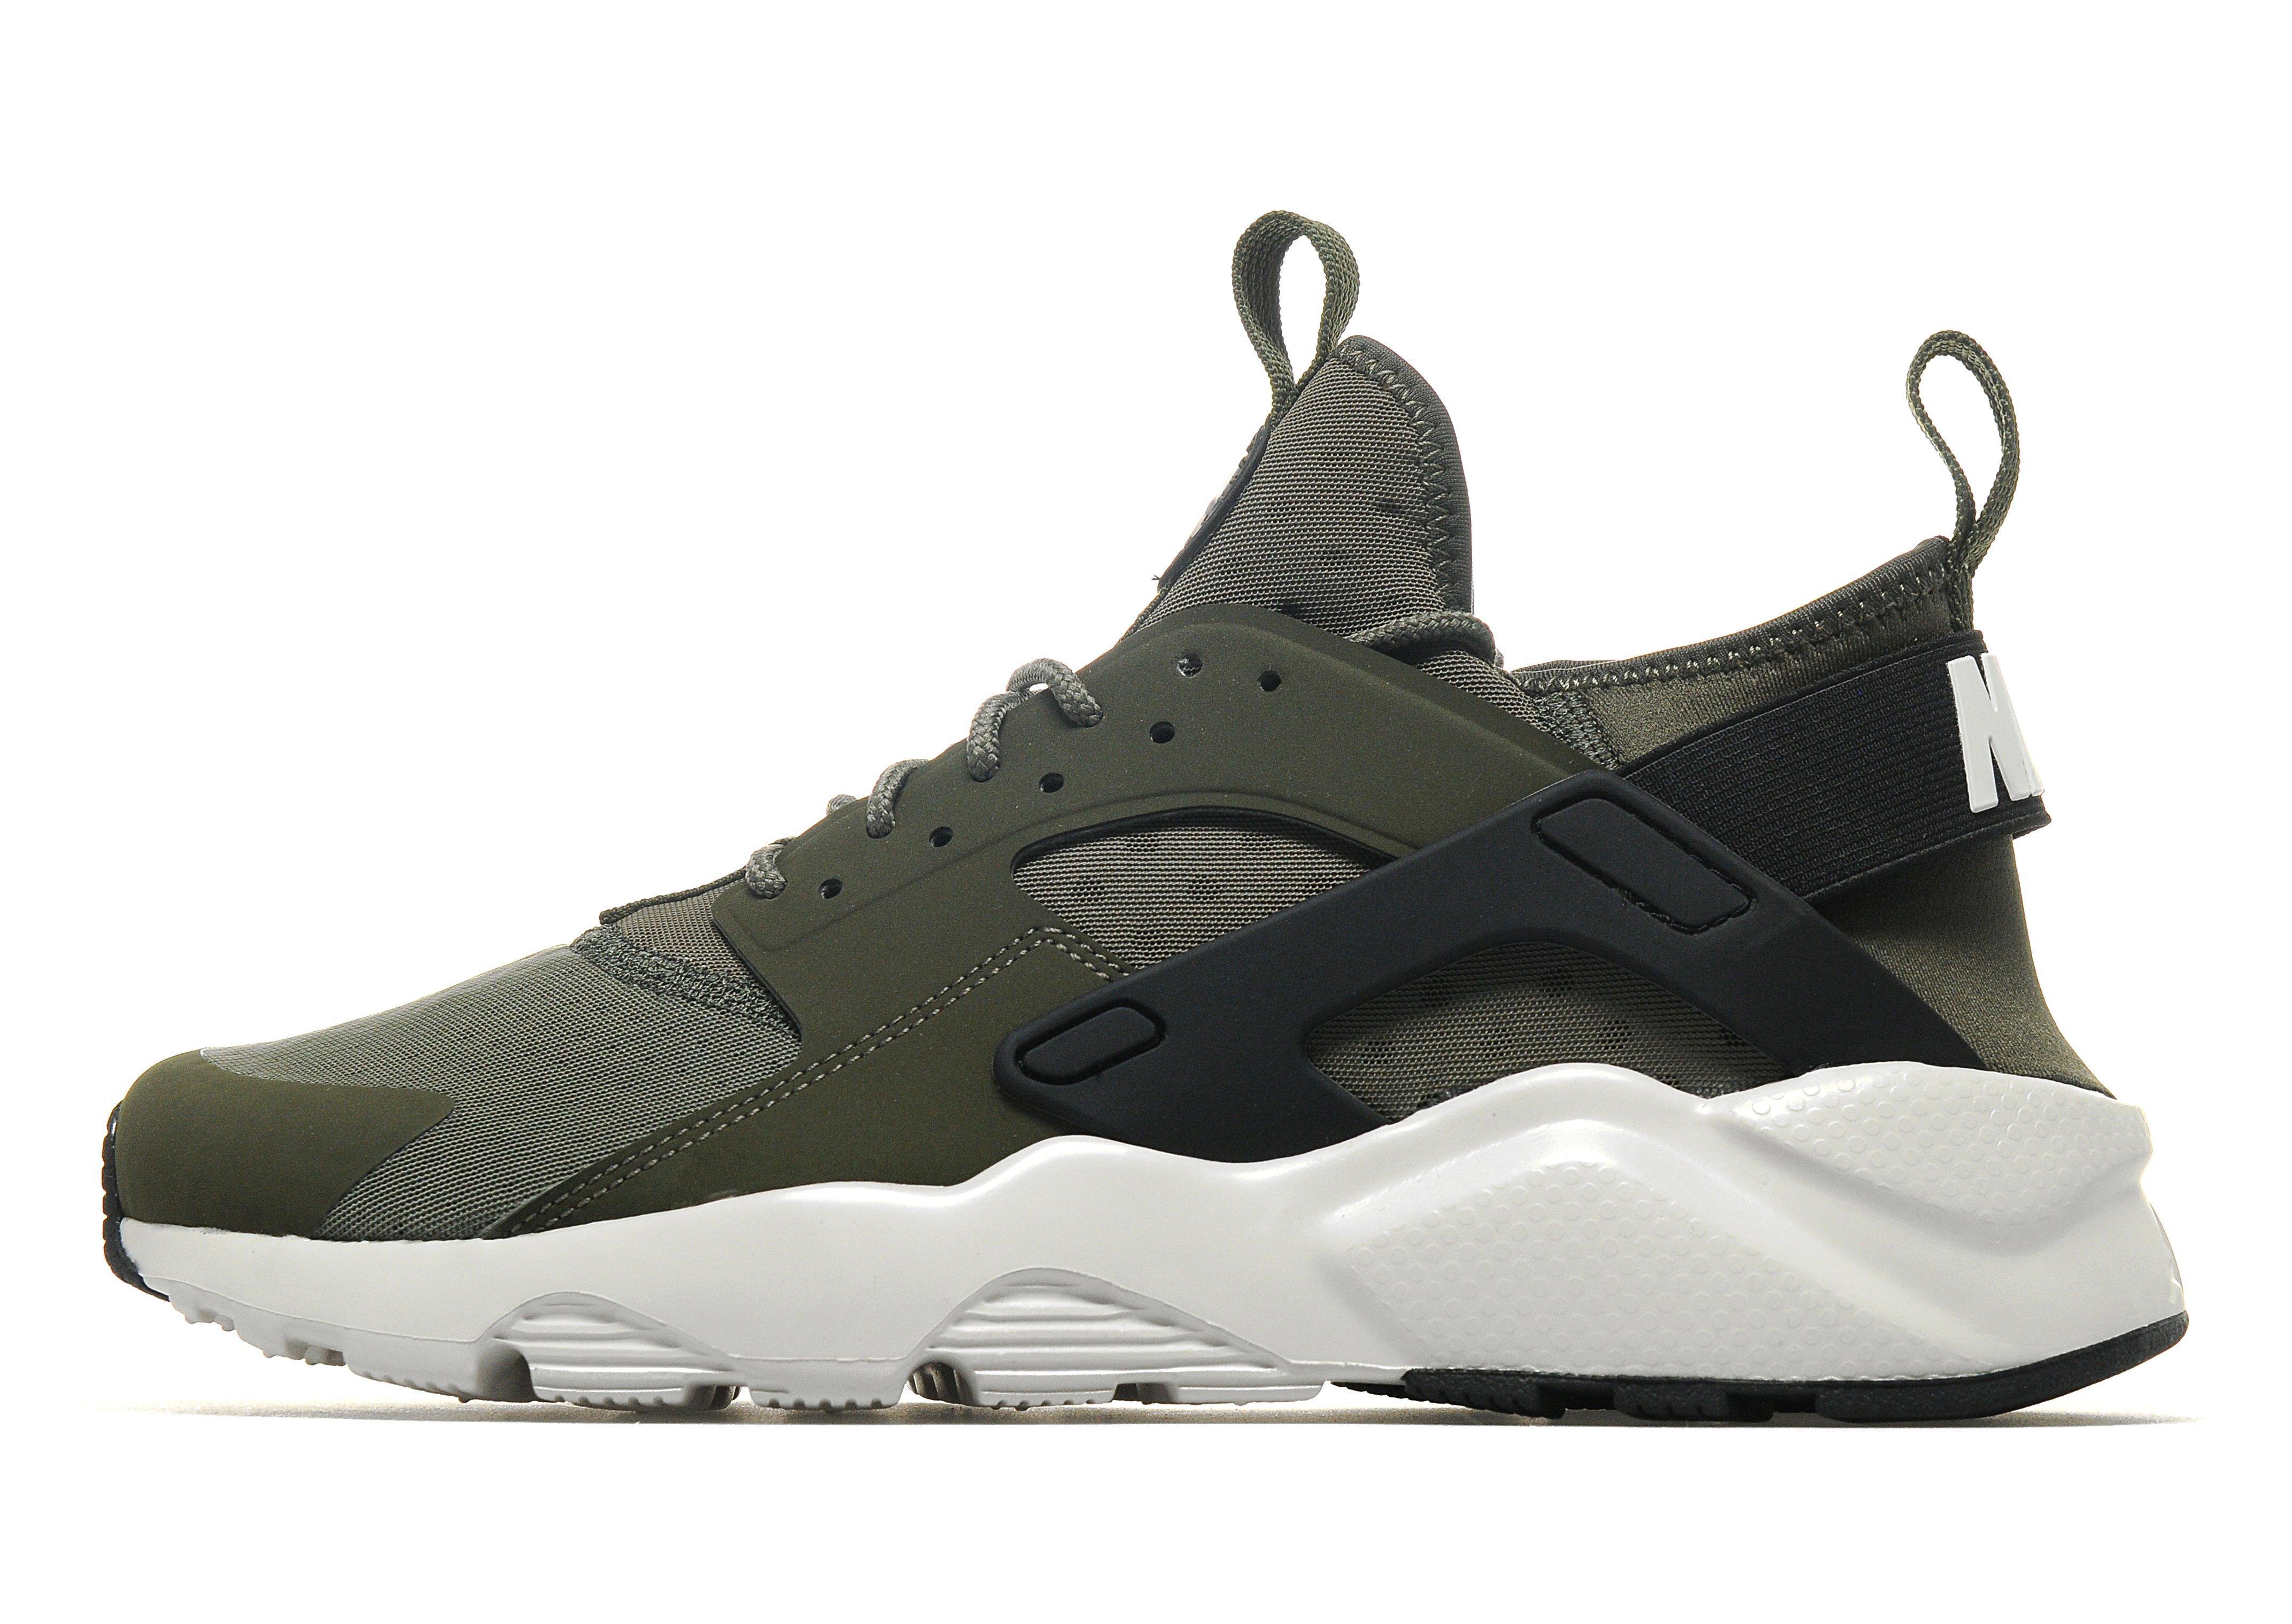 eea86741a8a2 Lyst - Nike Huarache Ultra for Men